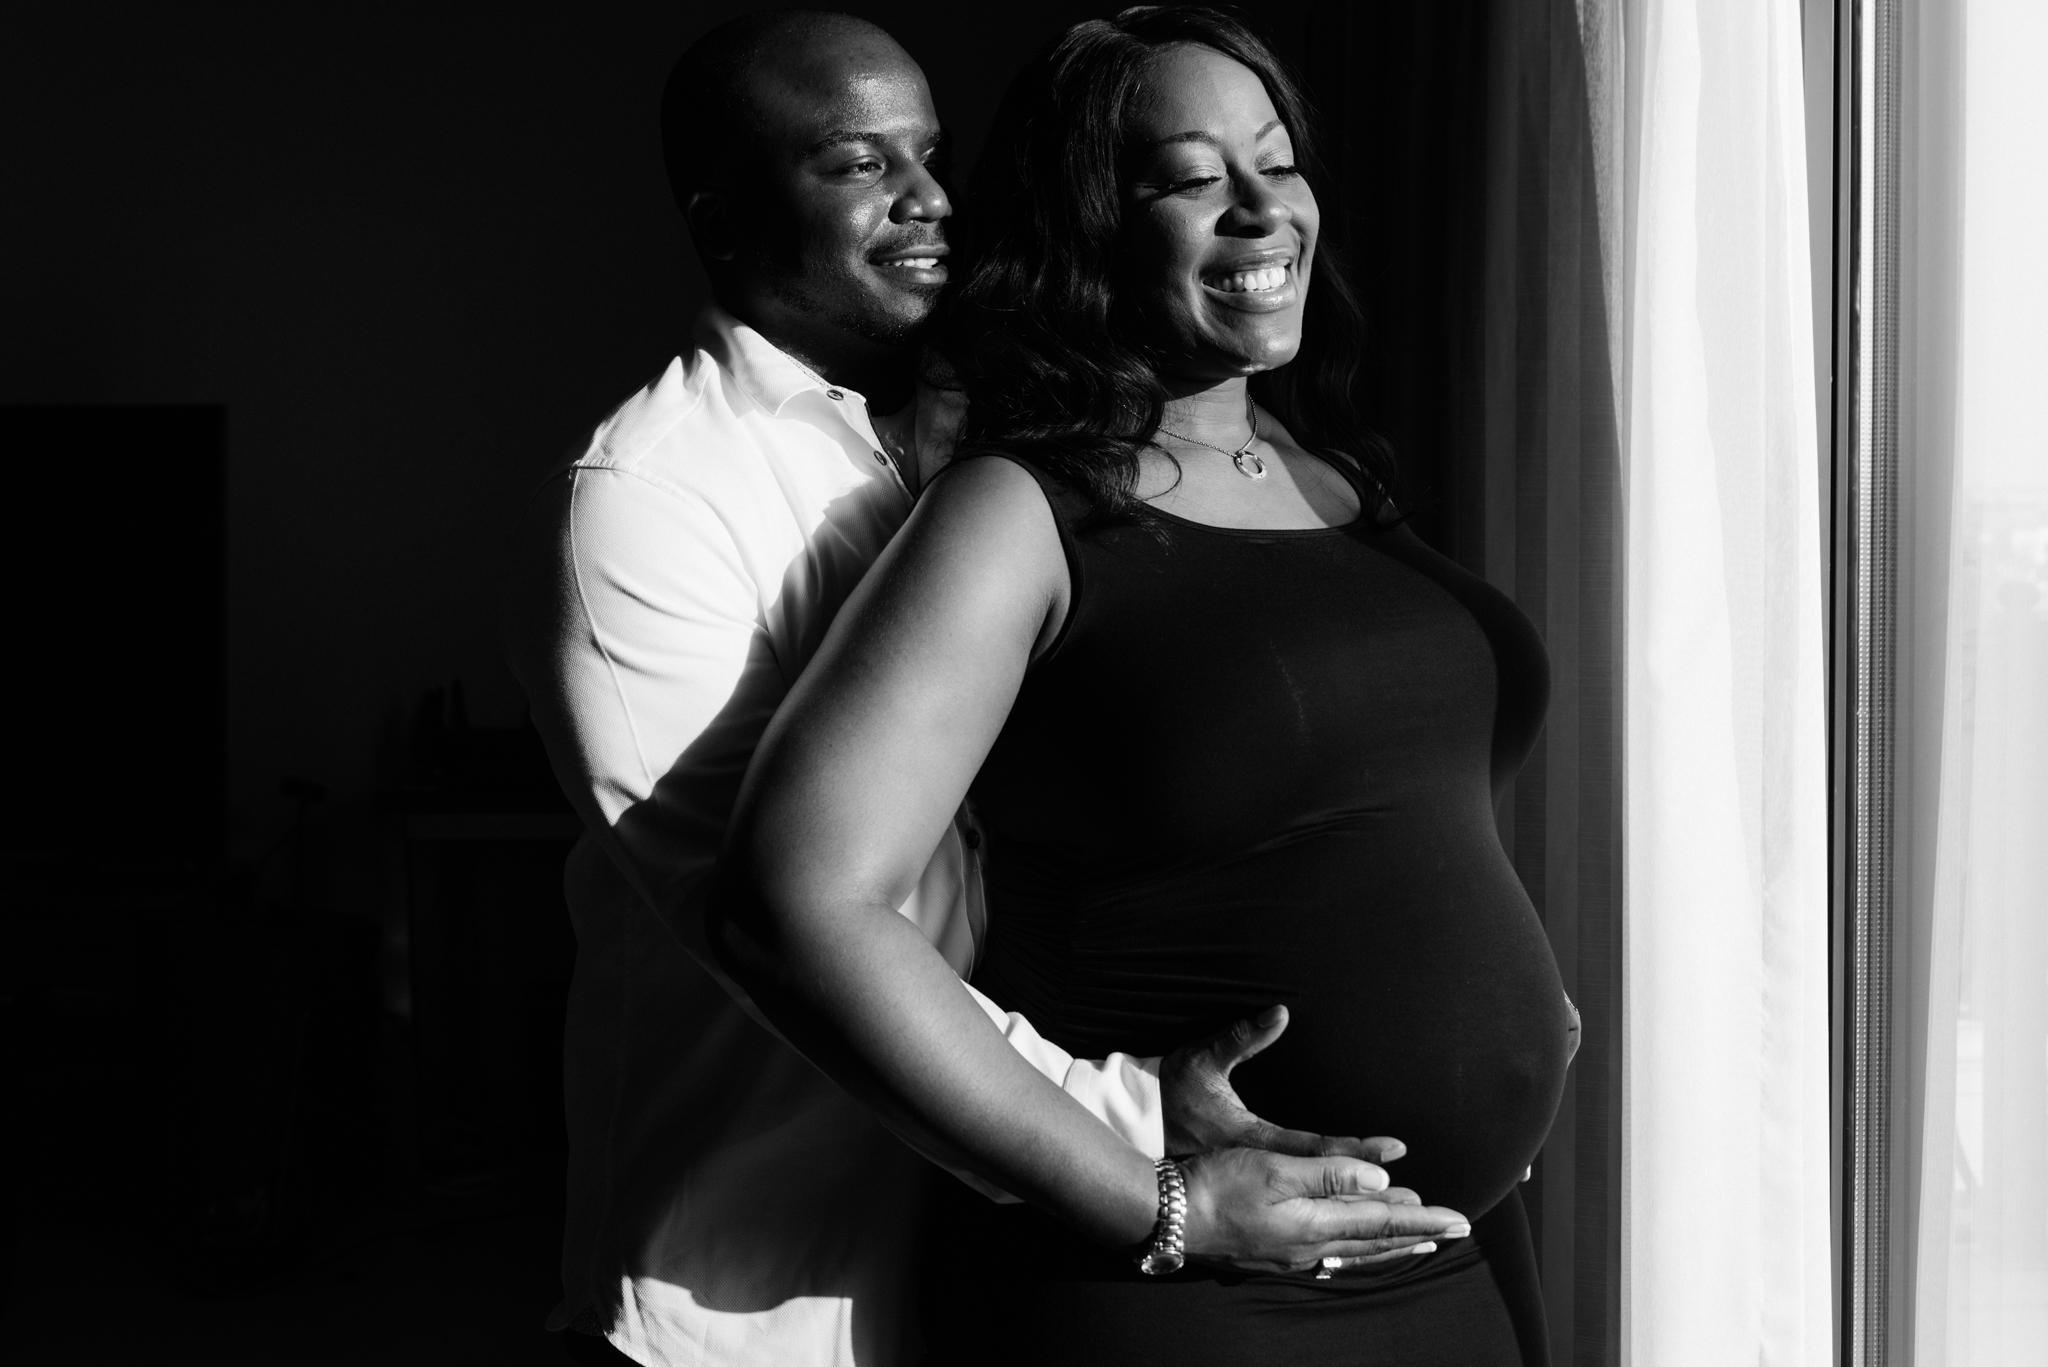 Lana-Photographs-Dubai-Maternity-Photographer-Kristina-PSLR-17.jpg